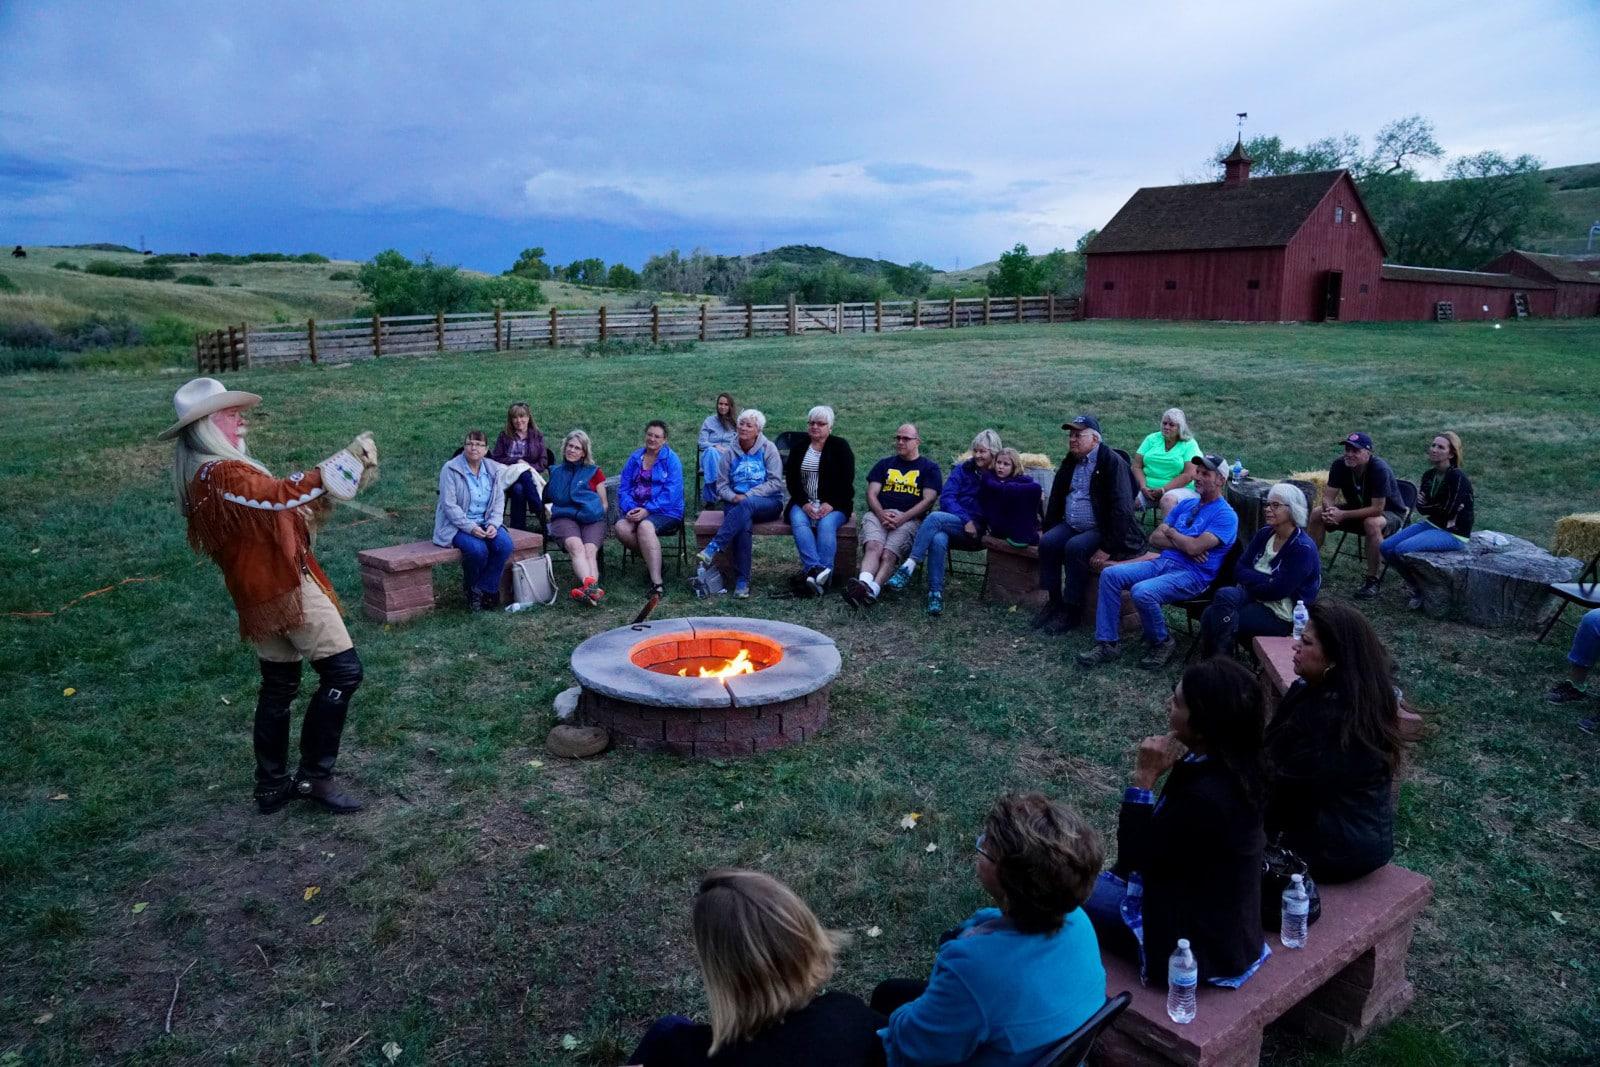 Image of a campfire at Schweiger Ranch in Lone Tree, Colorado